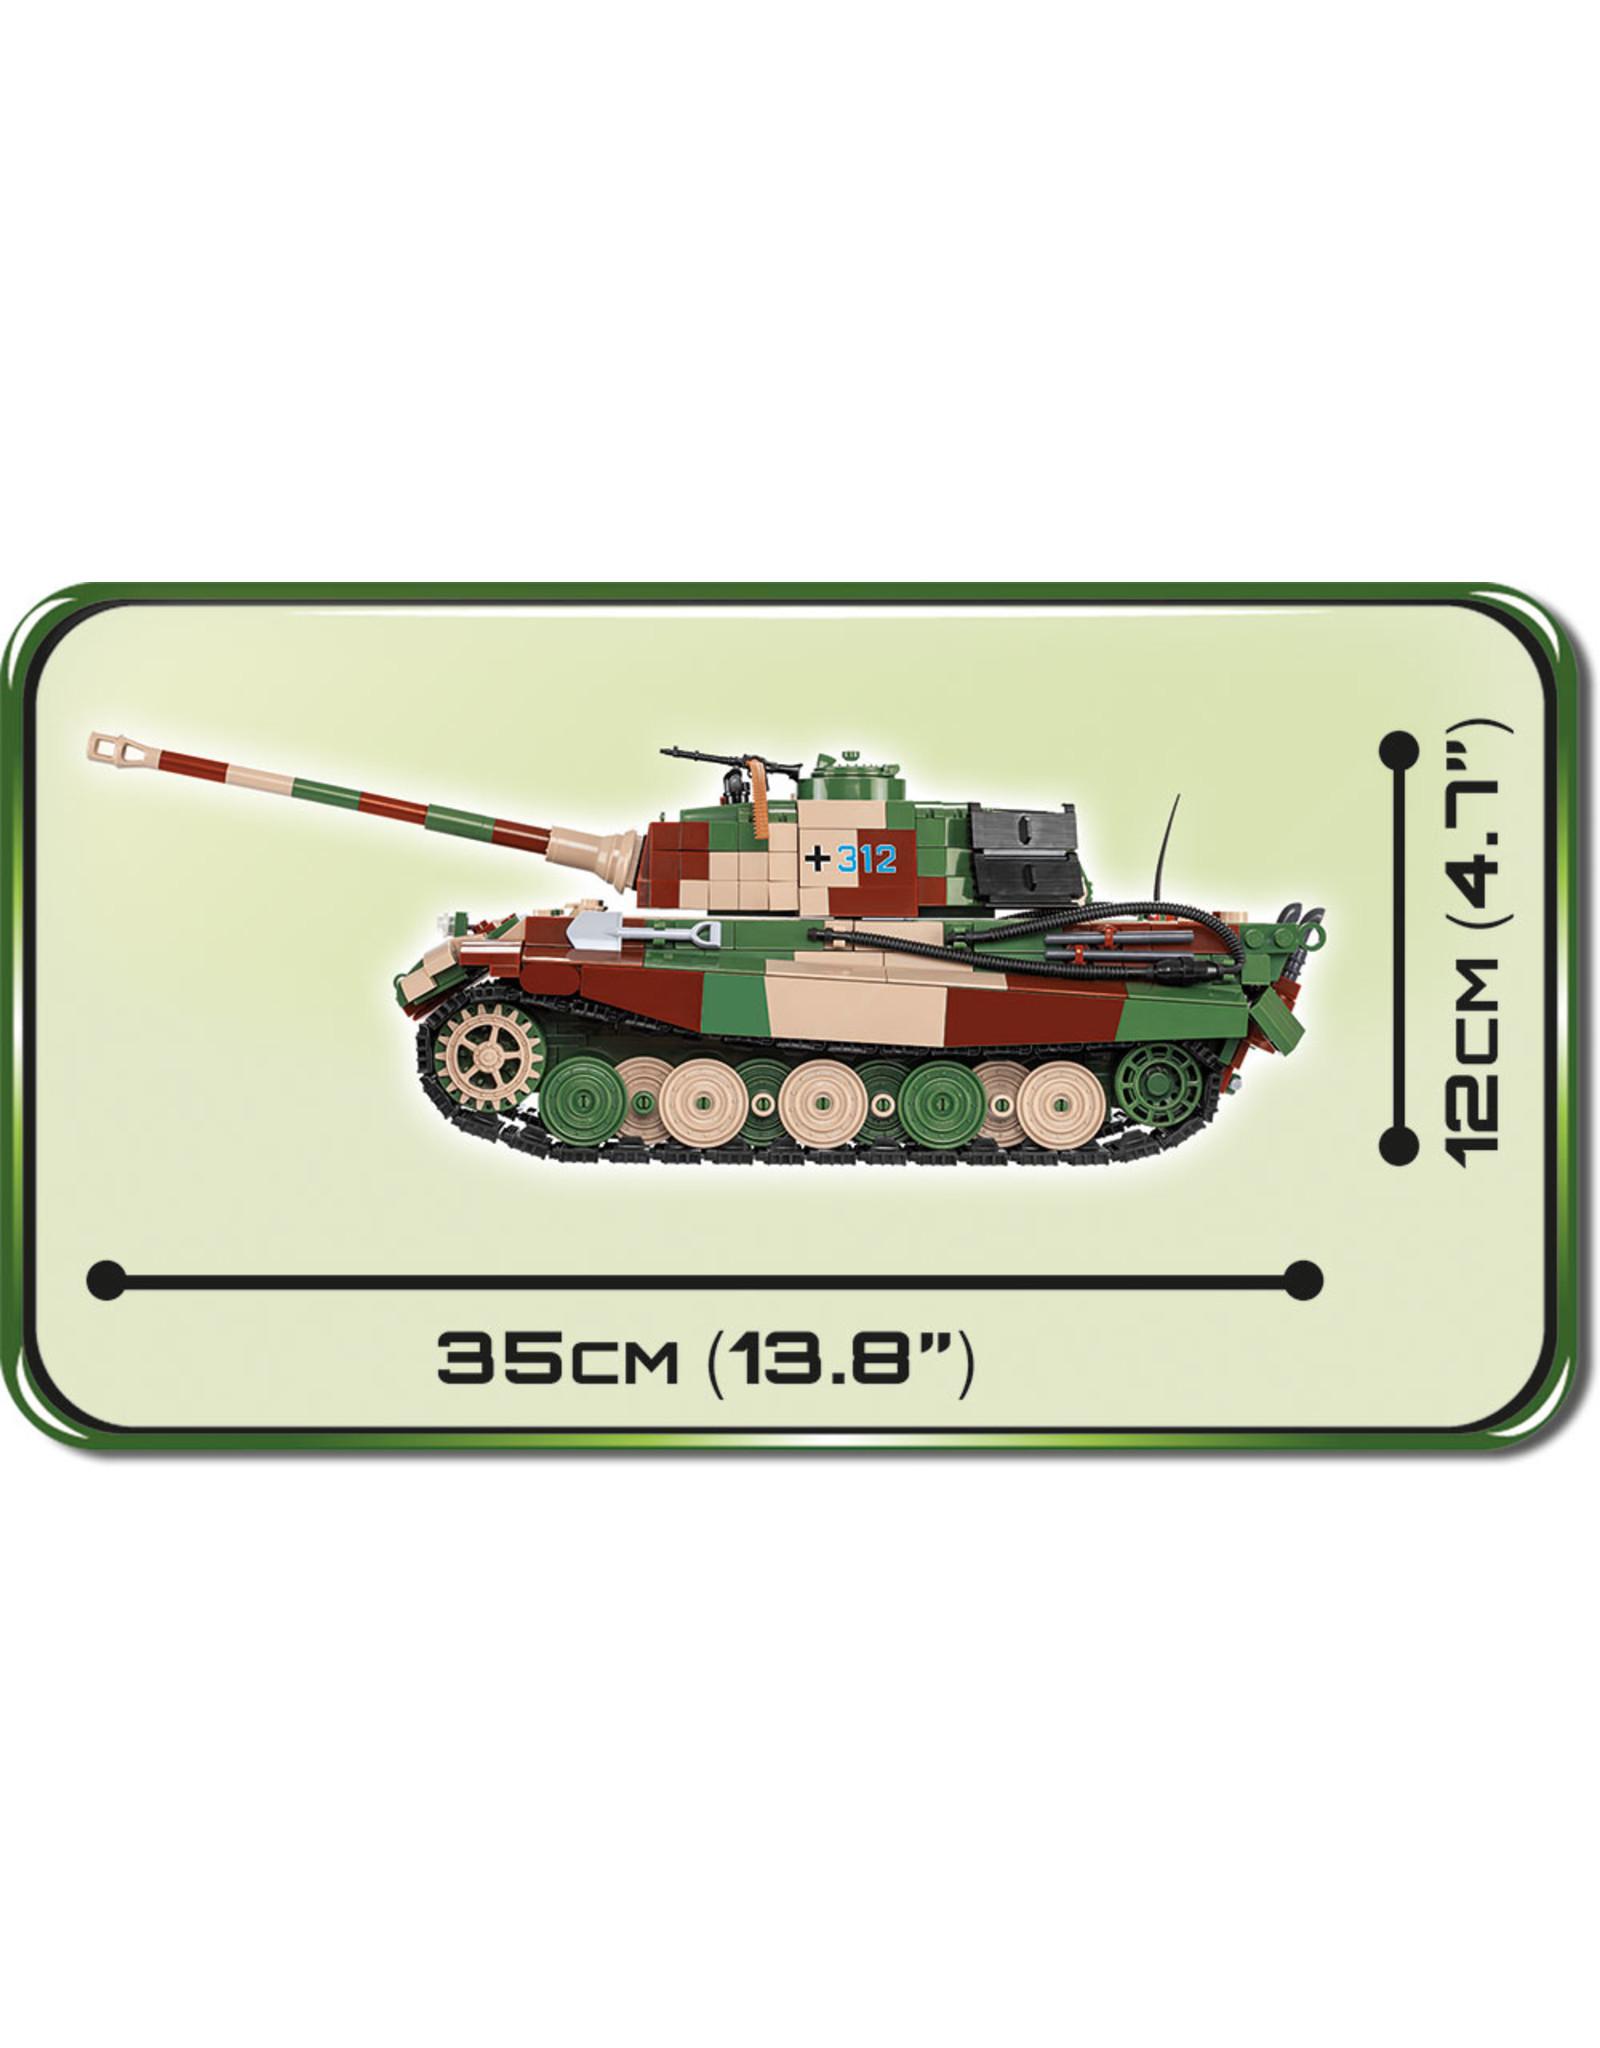 COBI Cobi WW2 2540 - Königstiger PzKpfW VI